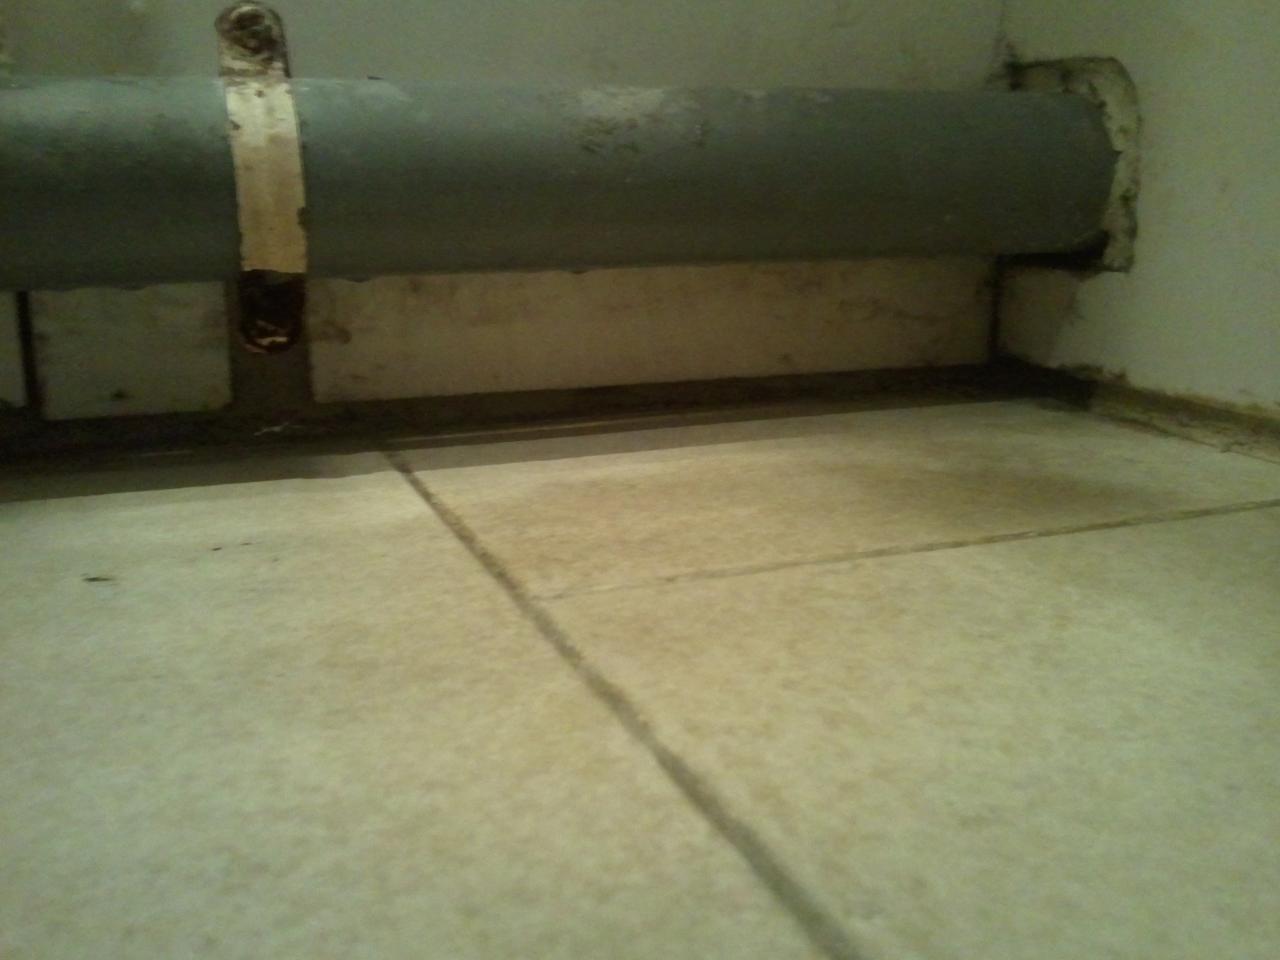 probl me de trous reboucher car froid qui rentre dans la sdb. Black Bedroom Furniture Sets. Home Design Ideas